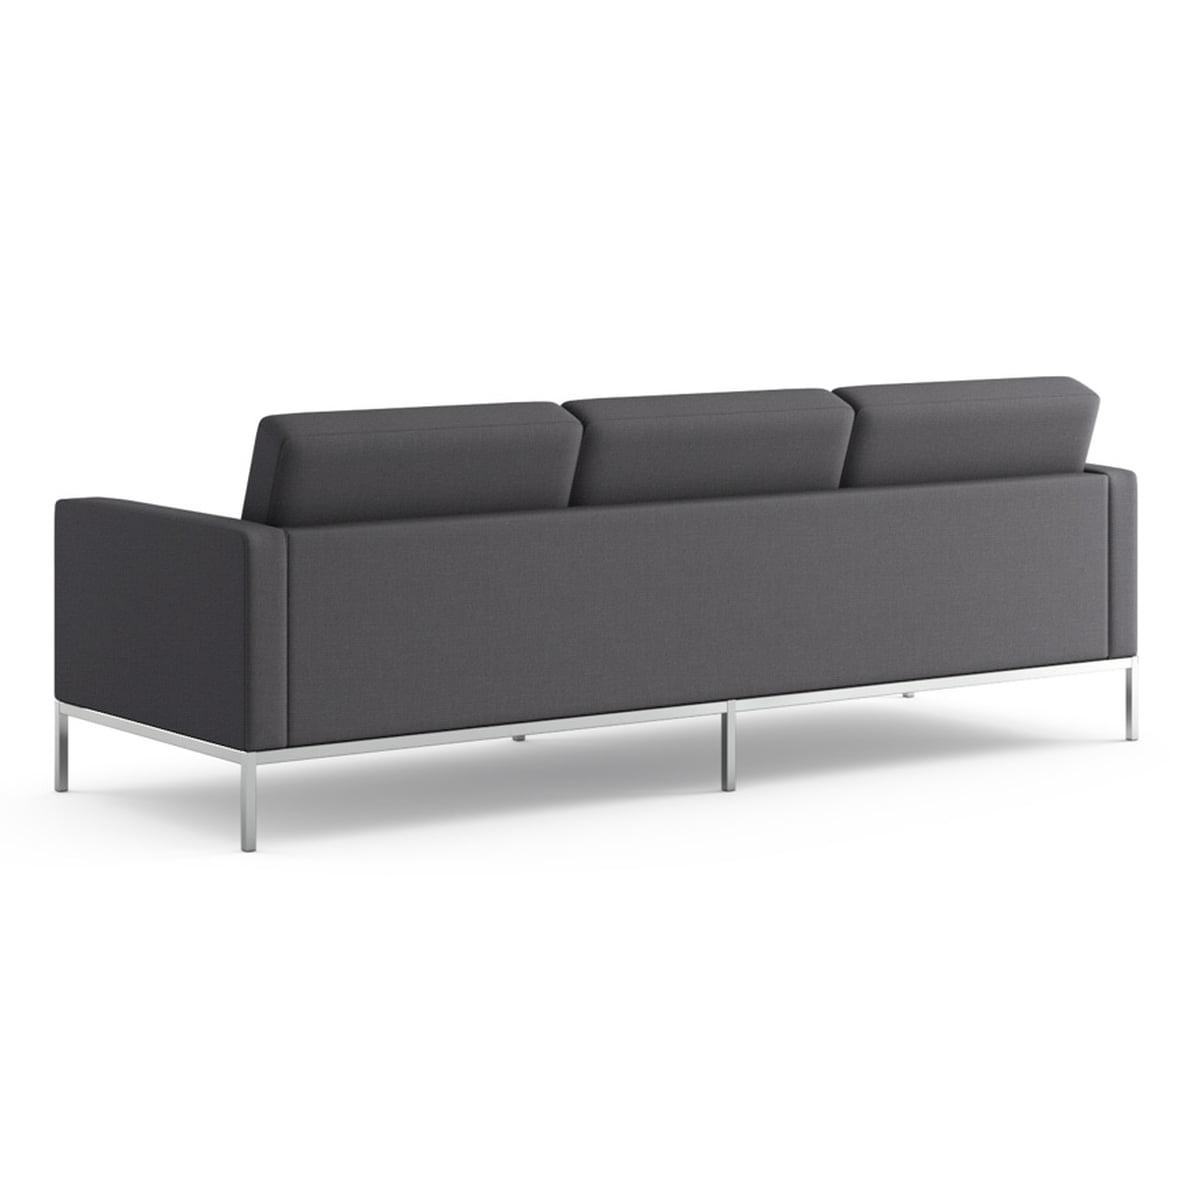 Knoll florence sofa 3 sitzer bezug hopsack charcoal